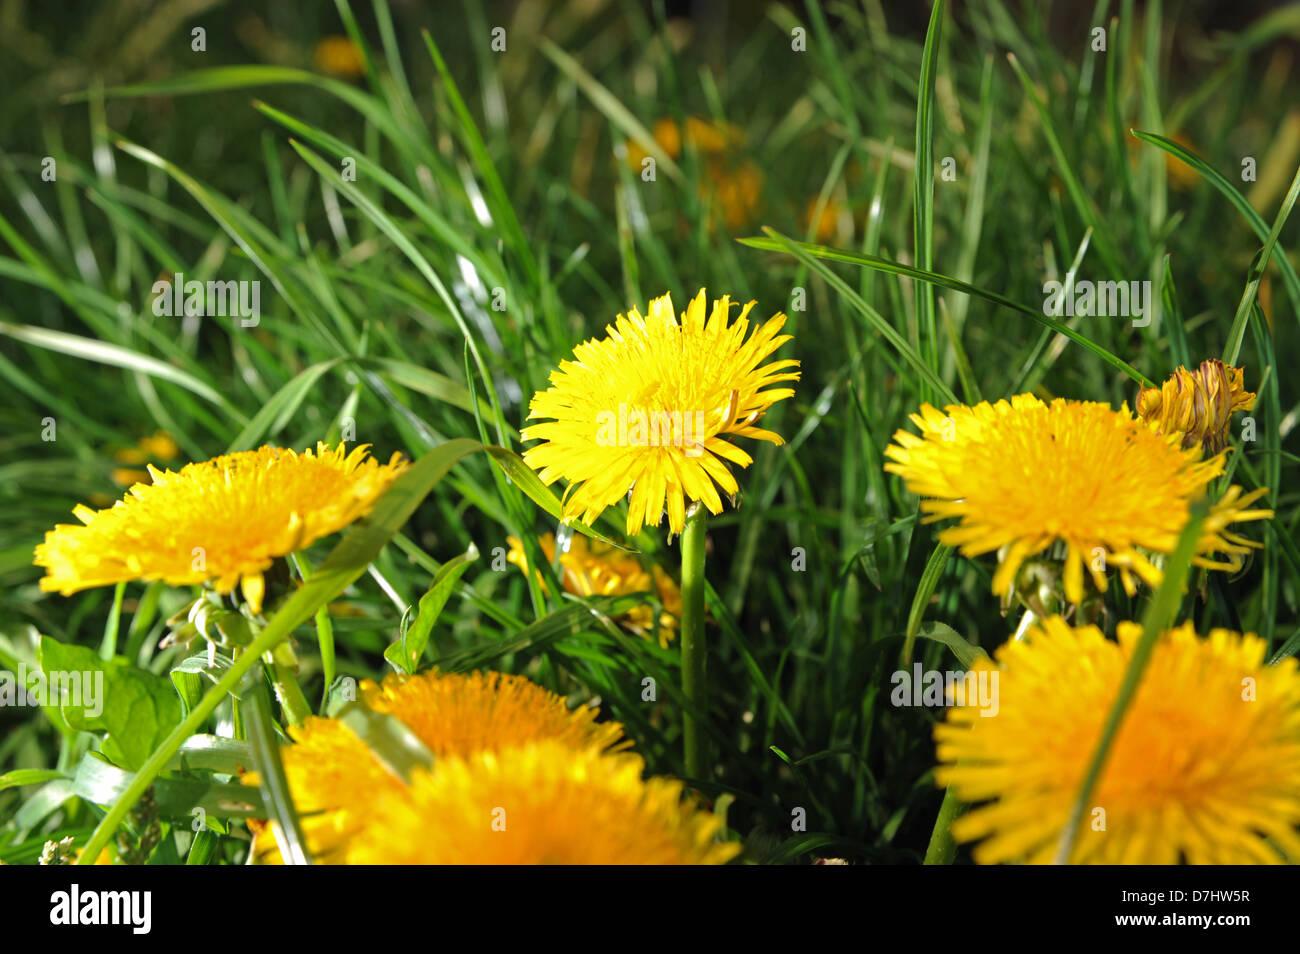 Yellow weeds stock photos yellow weeds stock images page 3 alamy golden yellow dandelions flowers or weeds scientific name taraxacum genus photograph taken by simon dack mightylinksfo